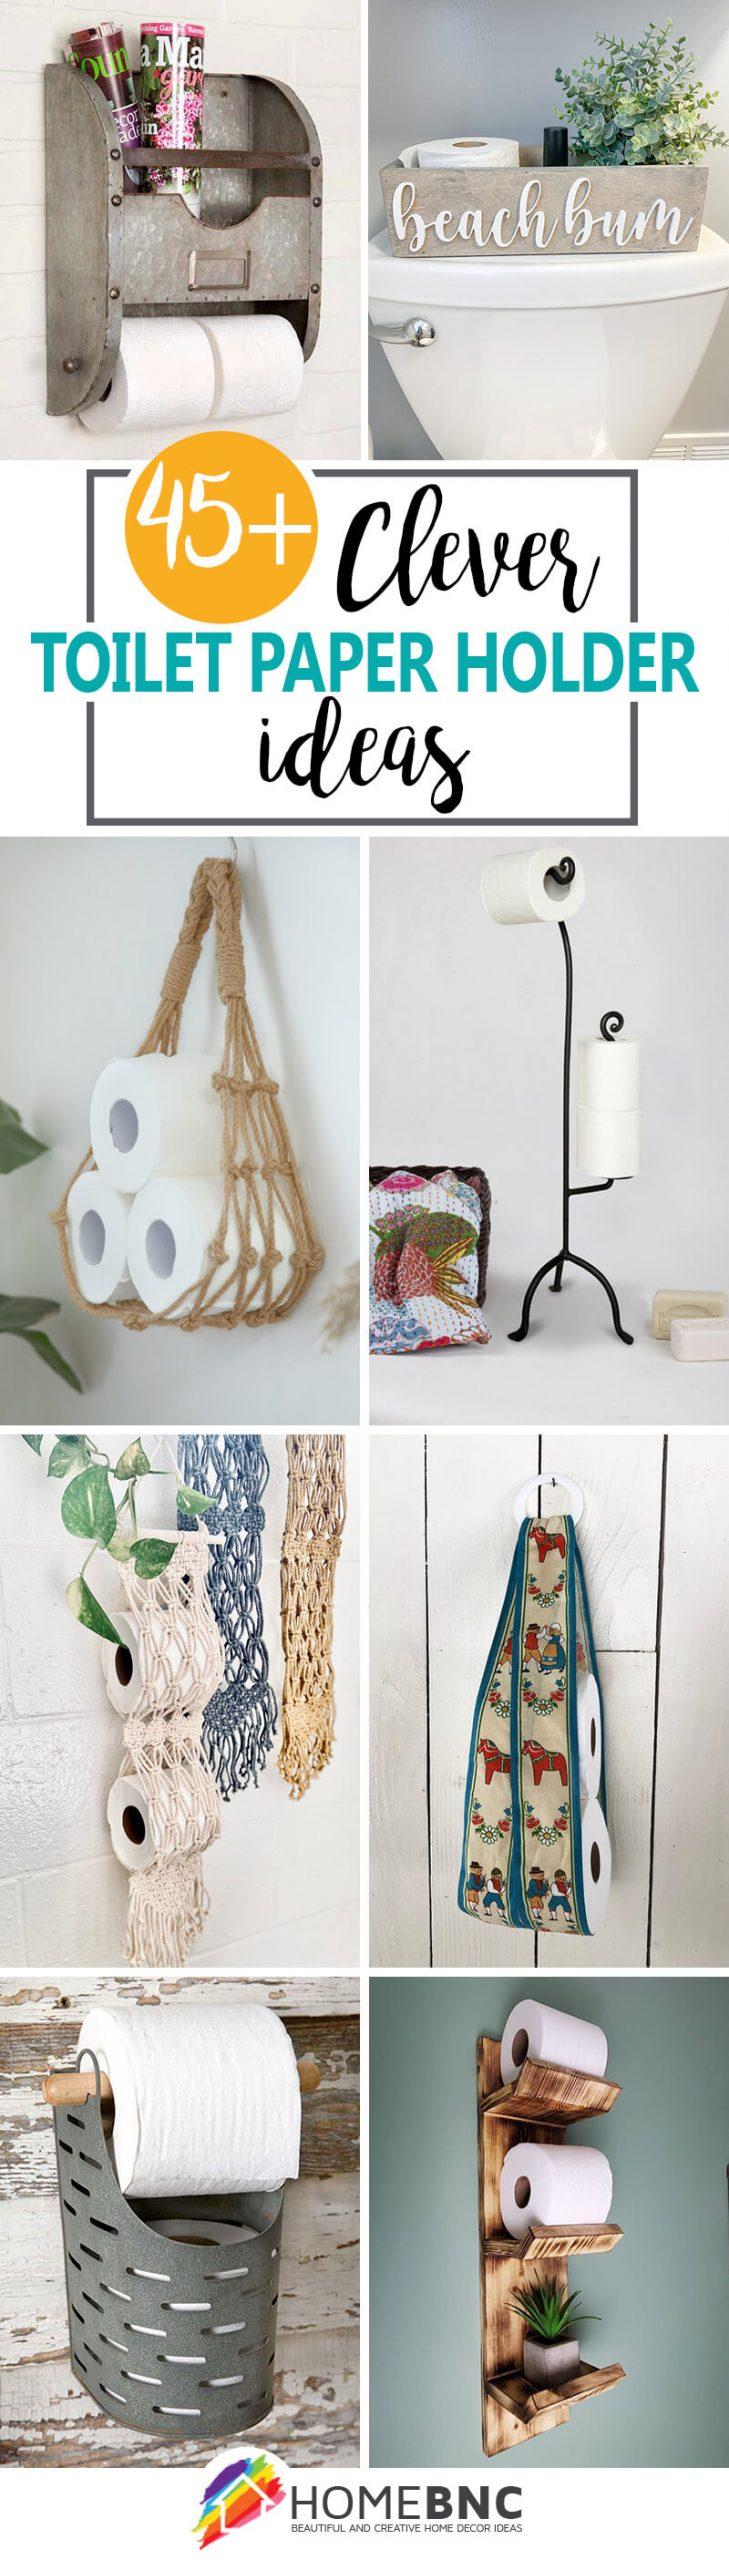 Best Toilet Paper Holder Ideas